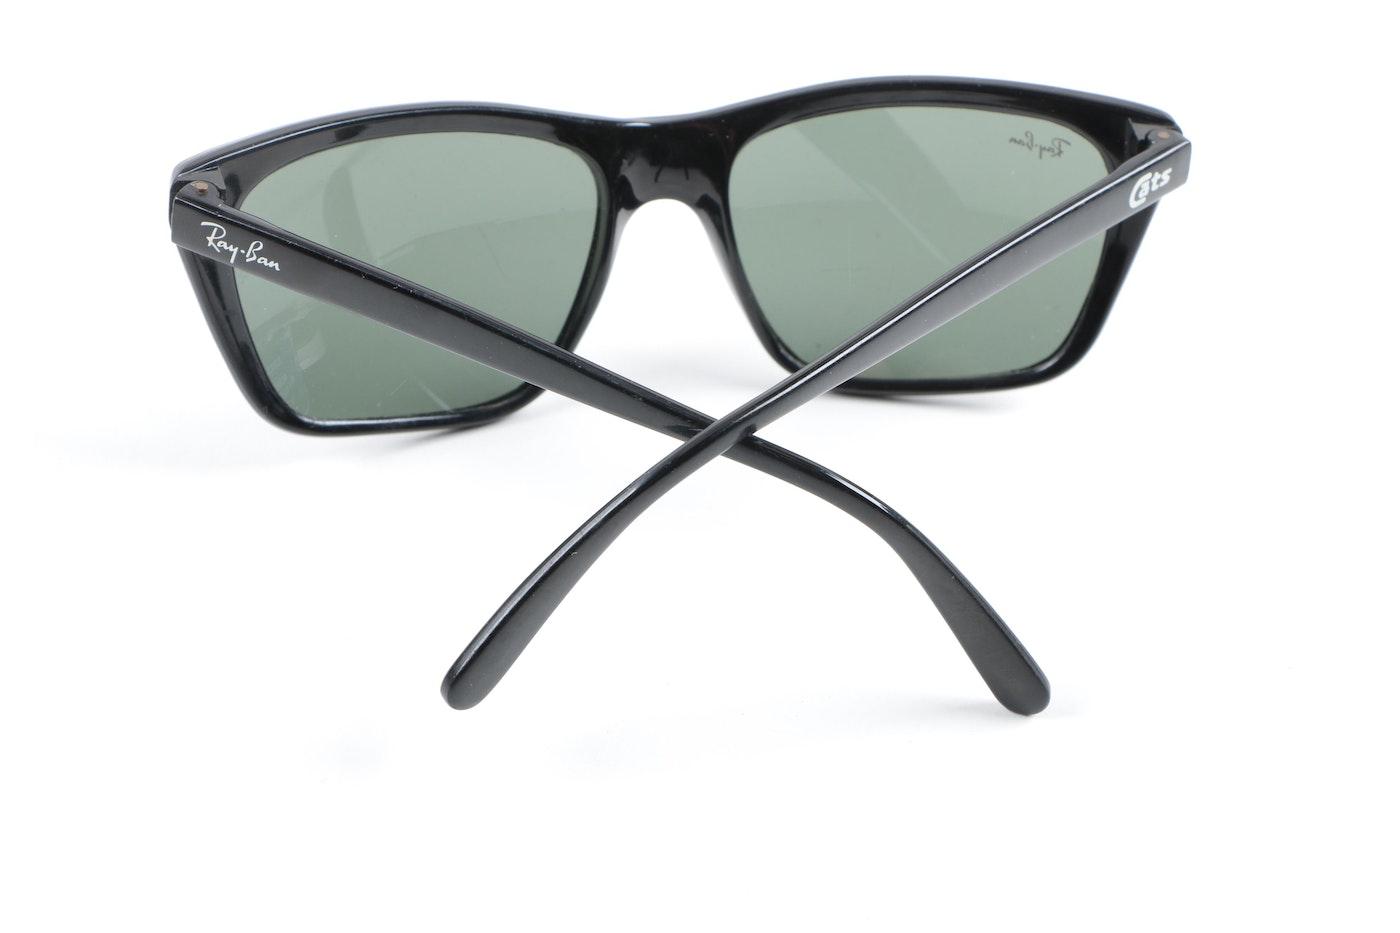 d74d27d6507 Vintage Style Ray Ban Sunglasses 5